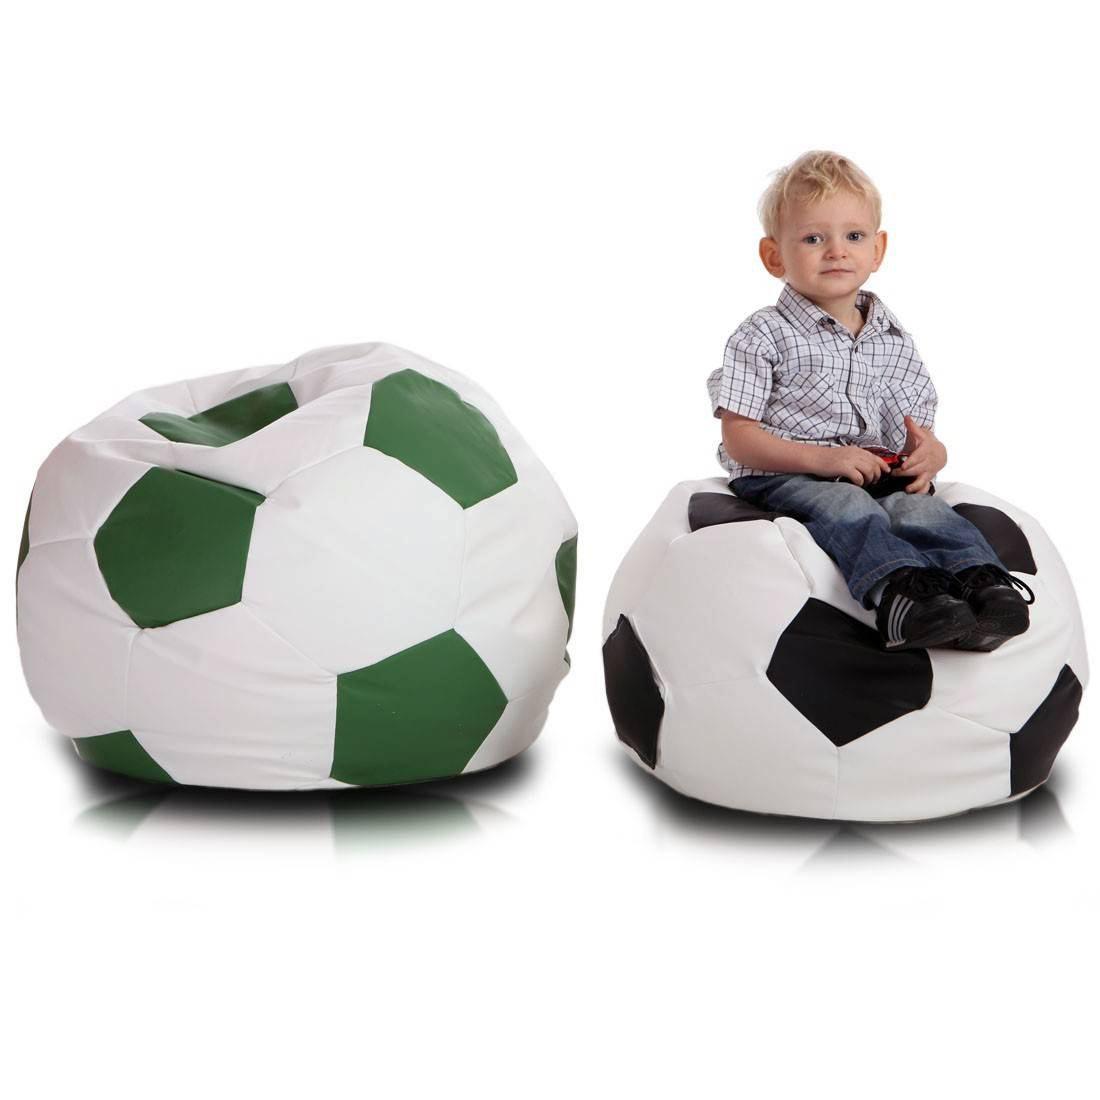 Fotbalový míč malý limo